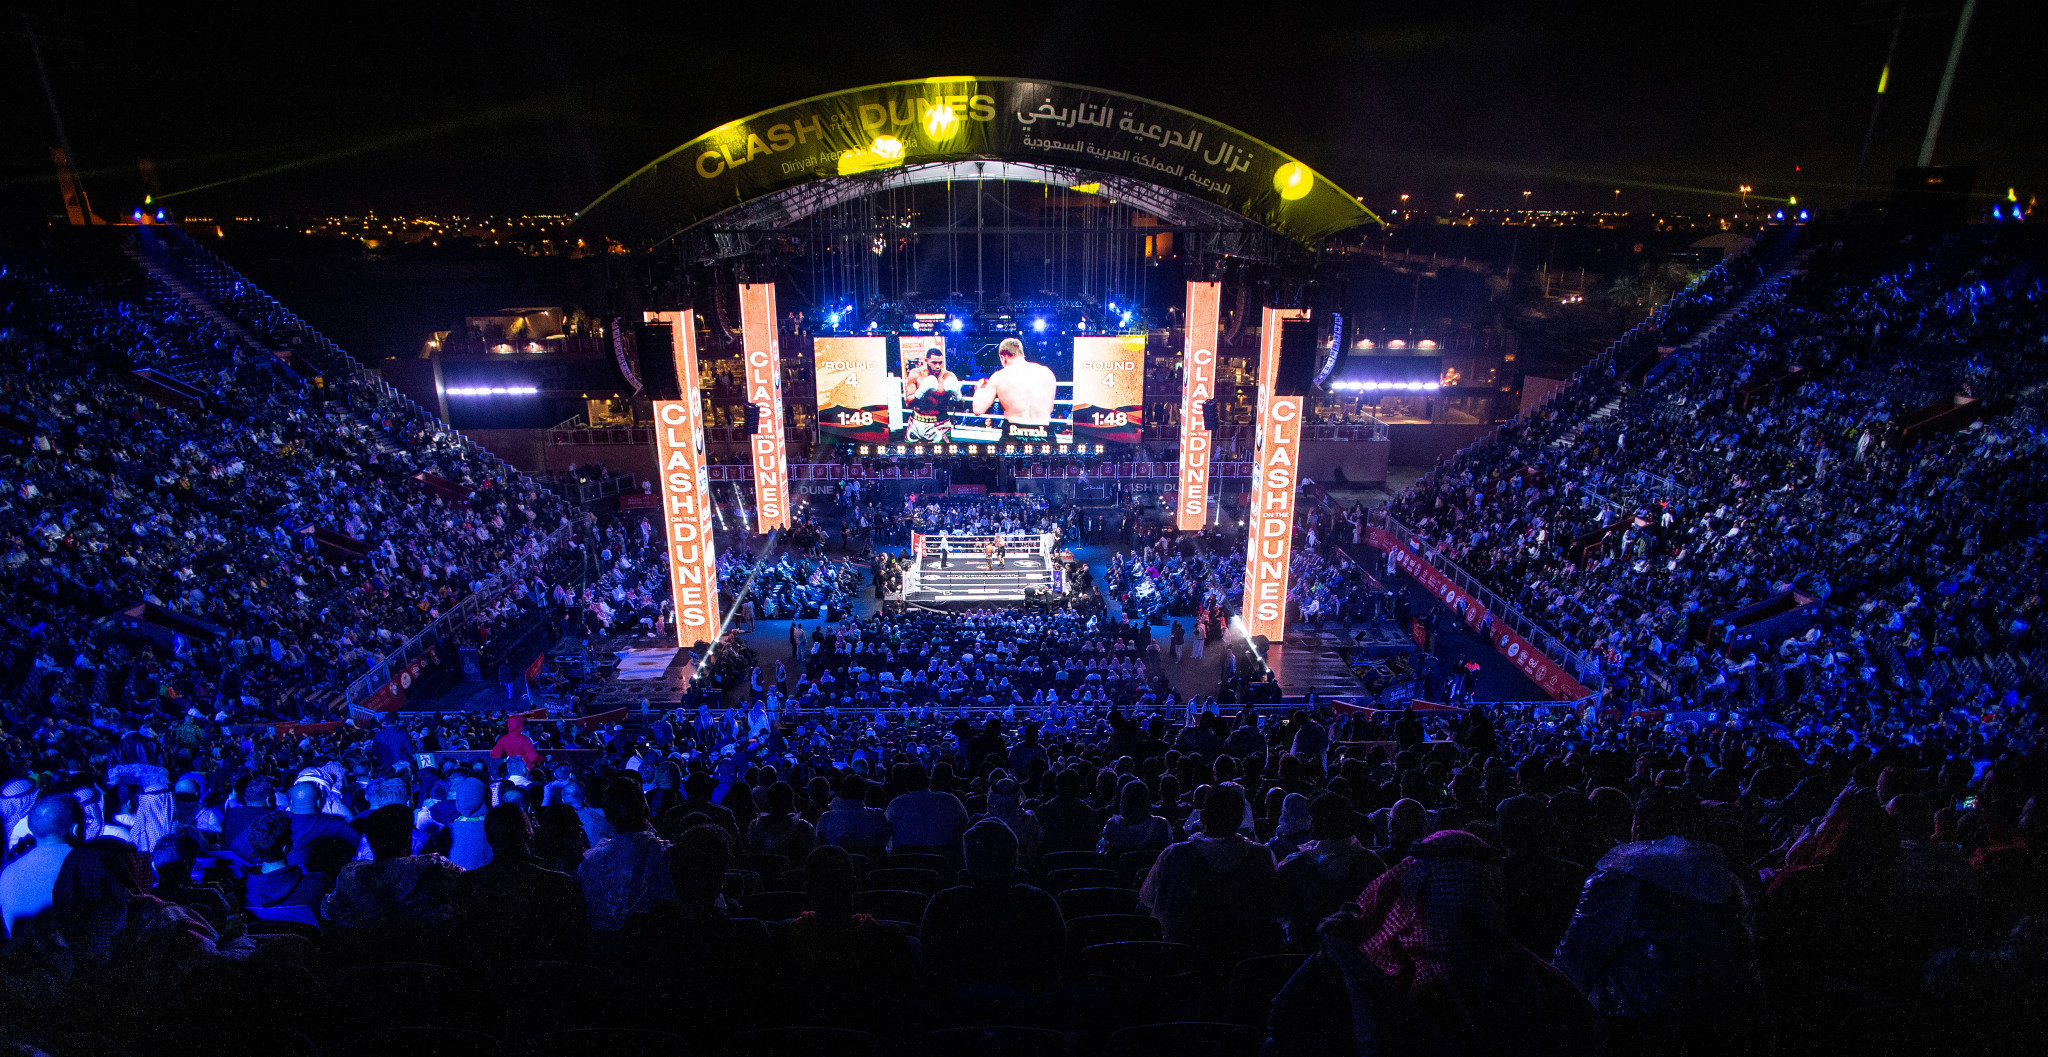 The heavyweight boxing showdown between Anthony Joshua and Andy Ruiz Jr shone a spotlight on Saudi Arabia ©Getty Images